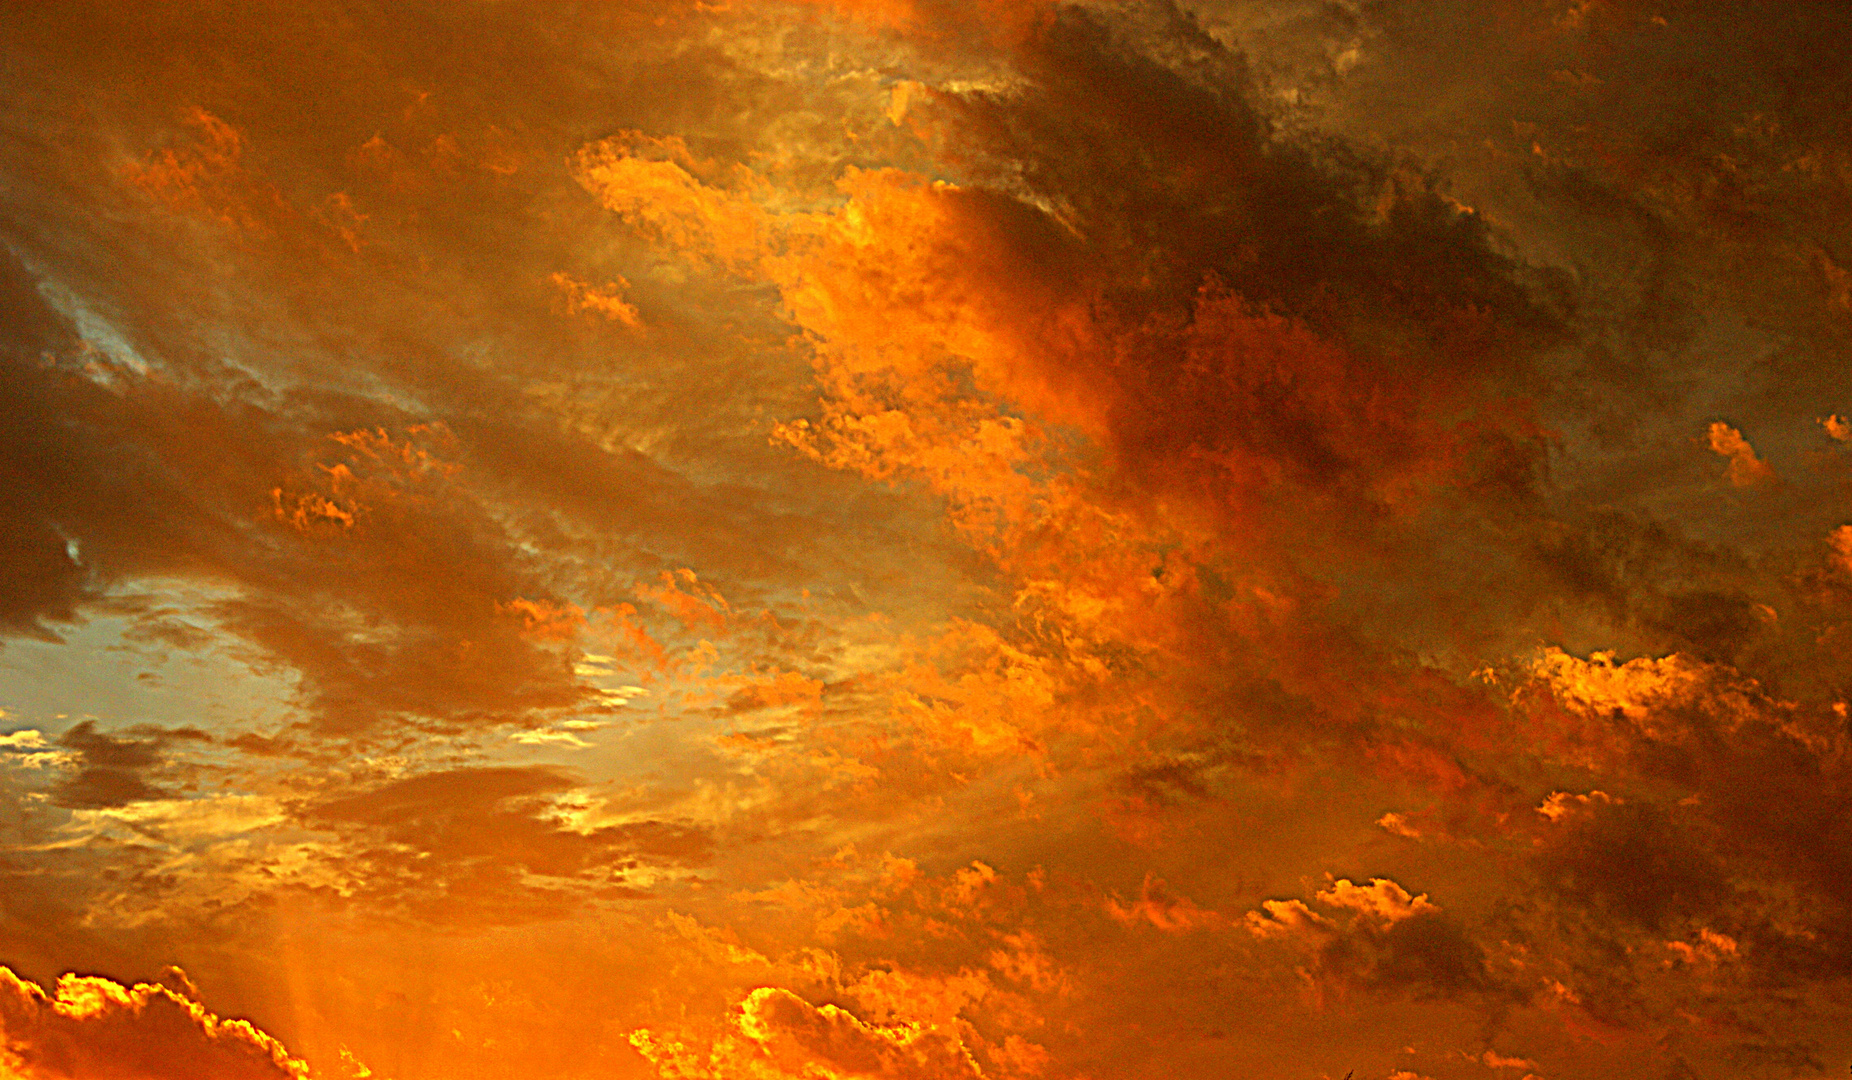 Sonnenuntergang à la deluxe